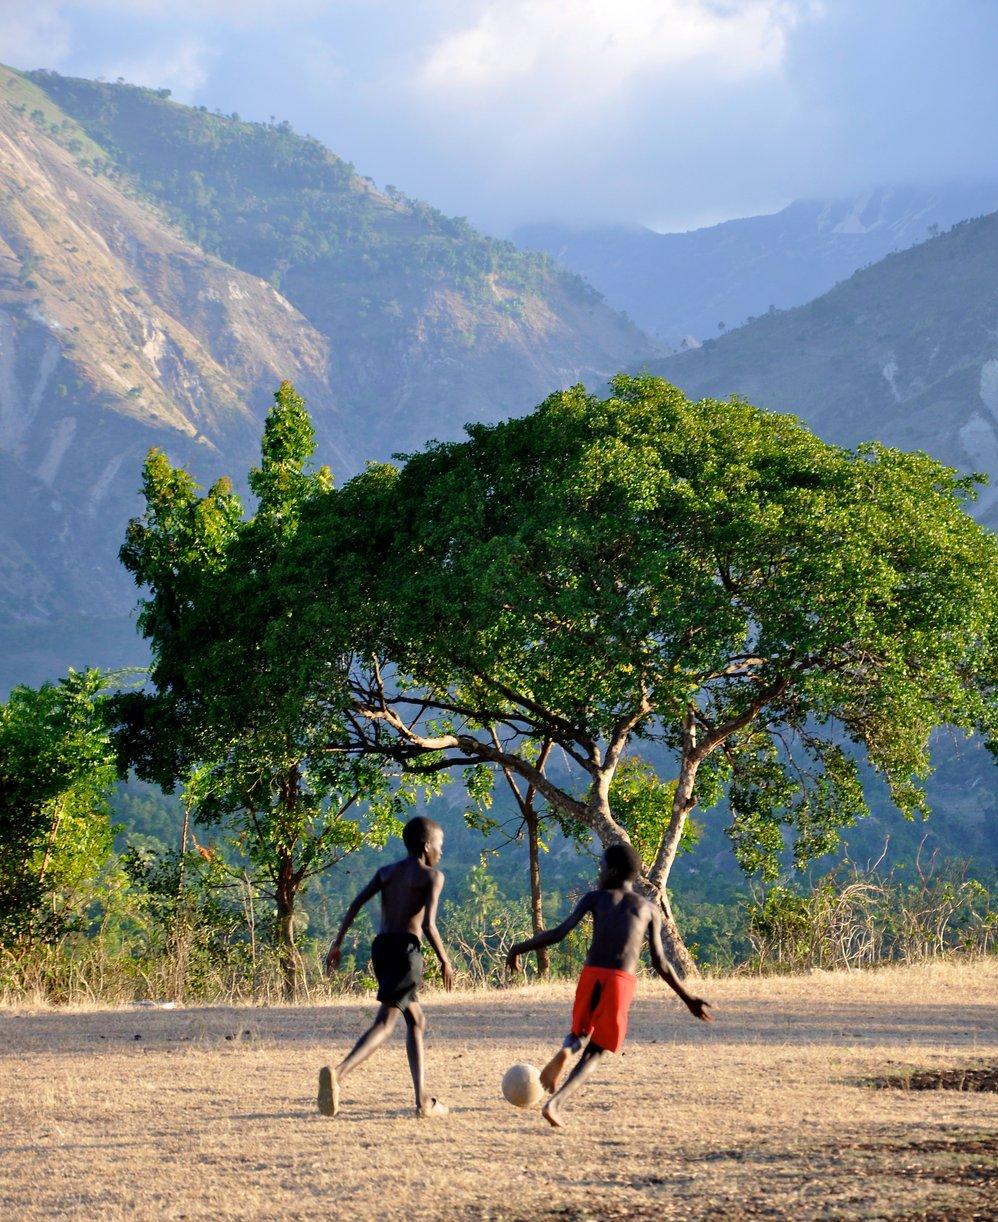 Haitian Soccer Field